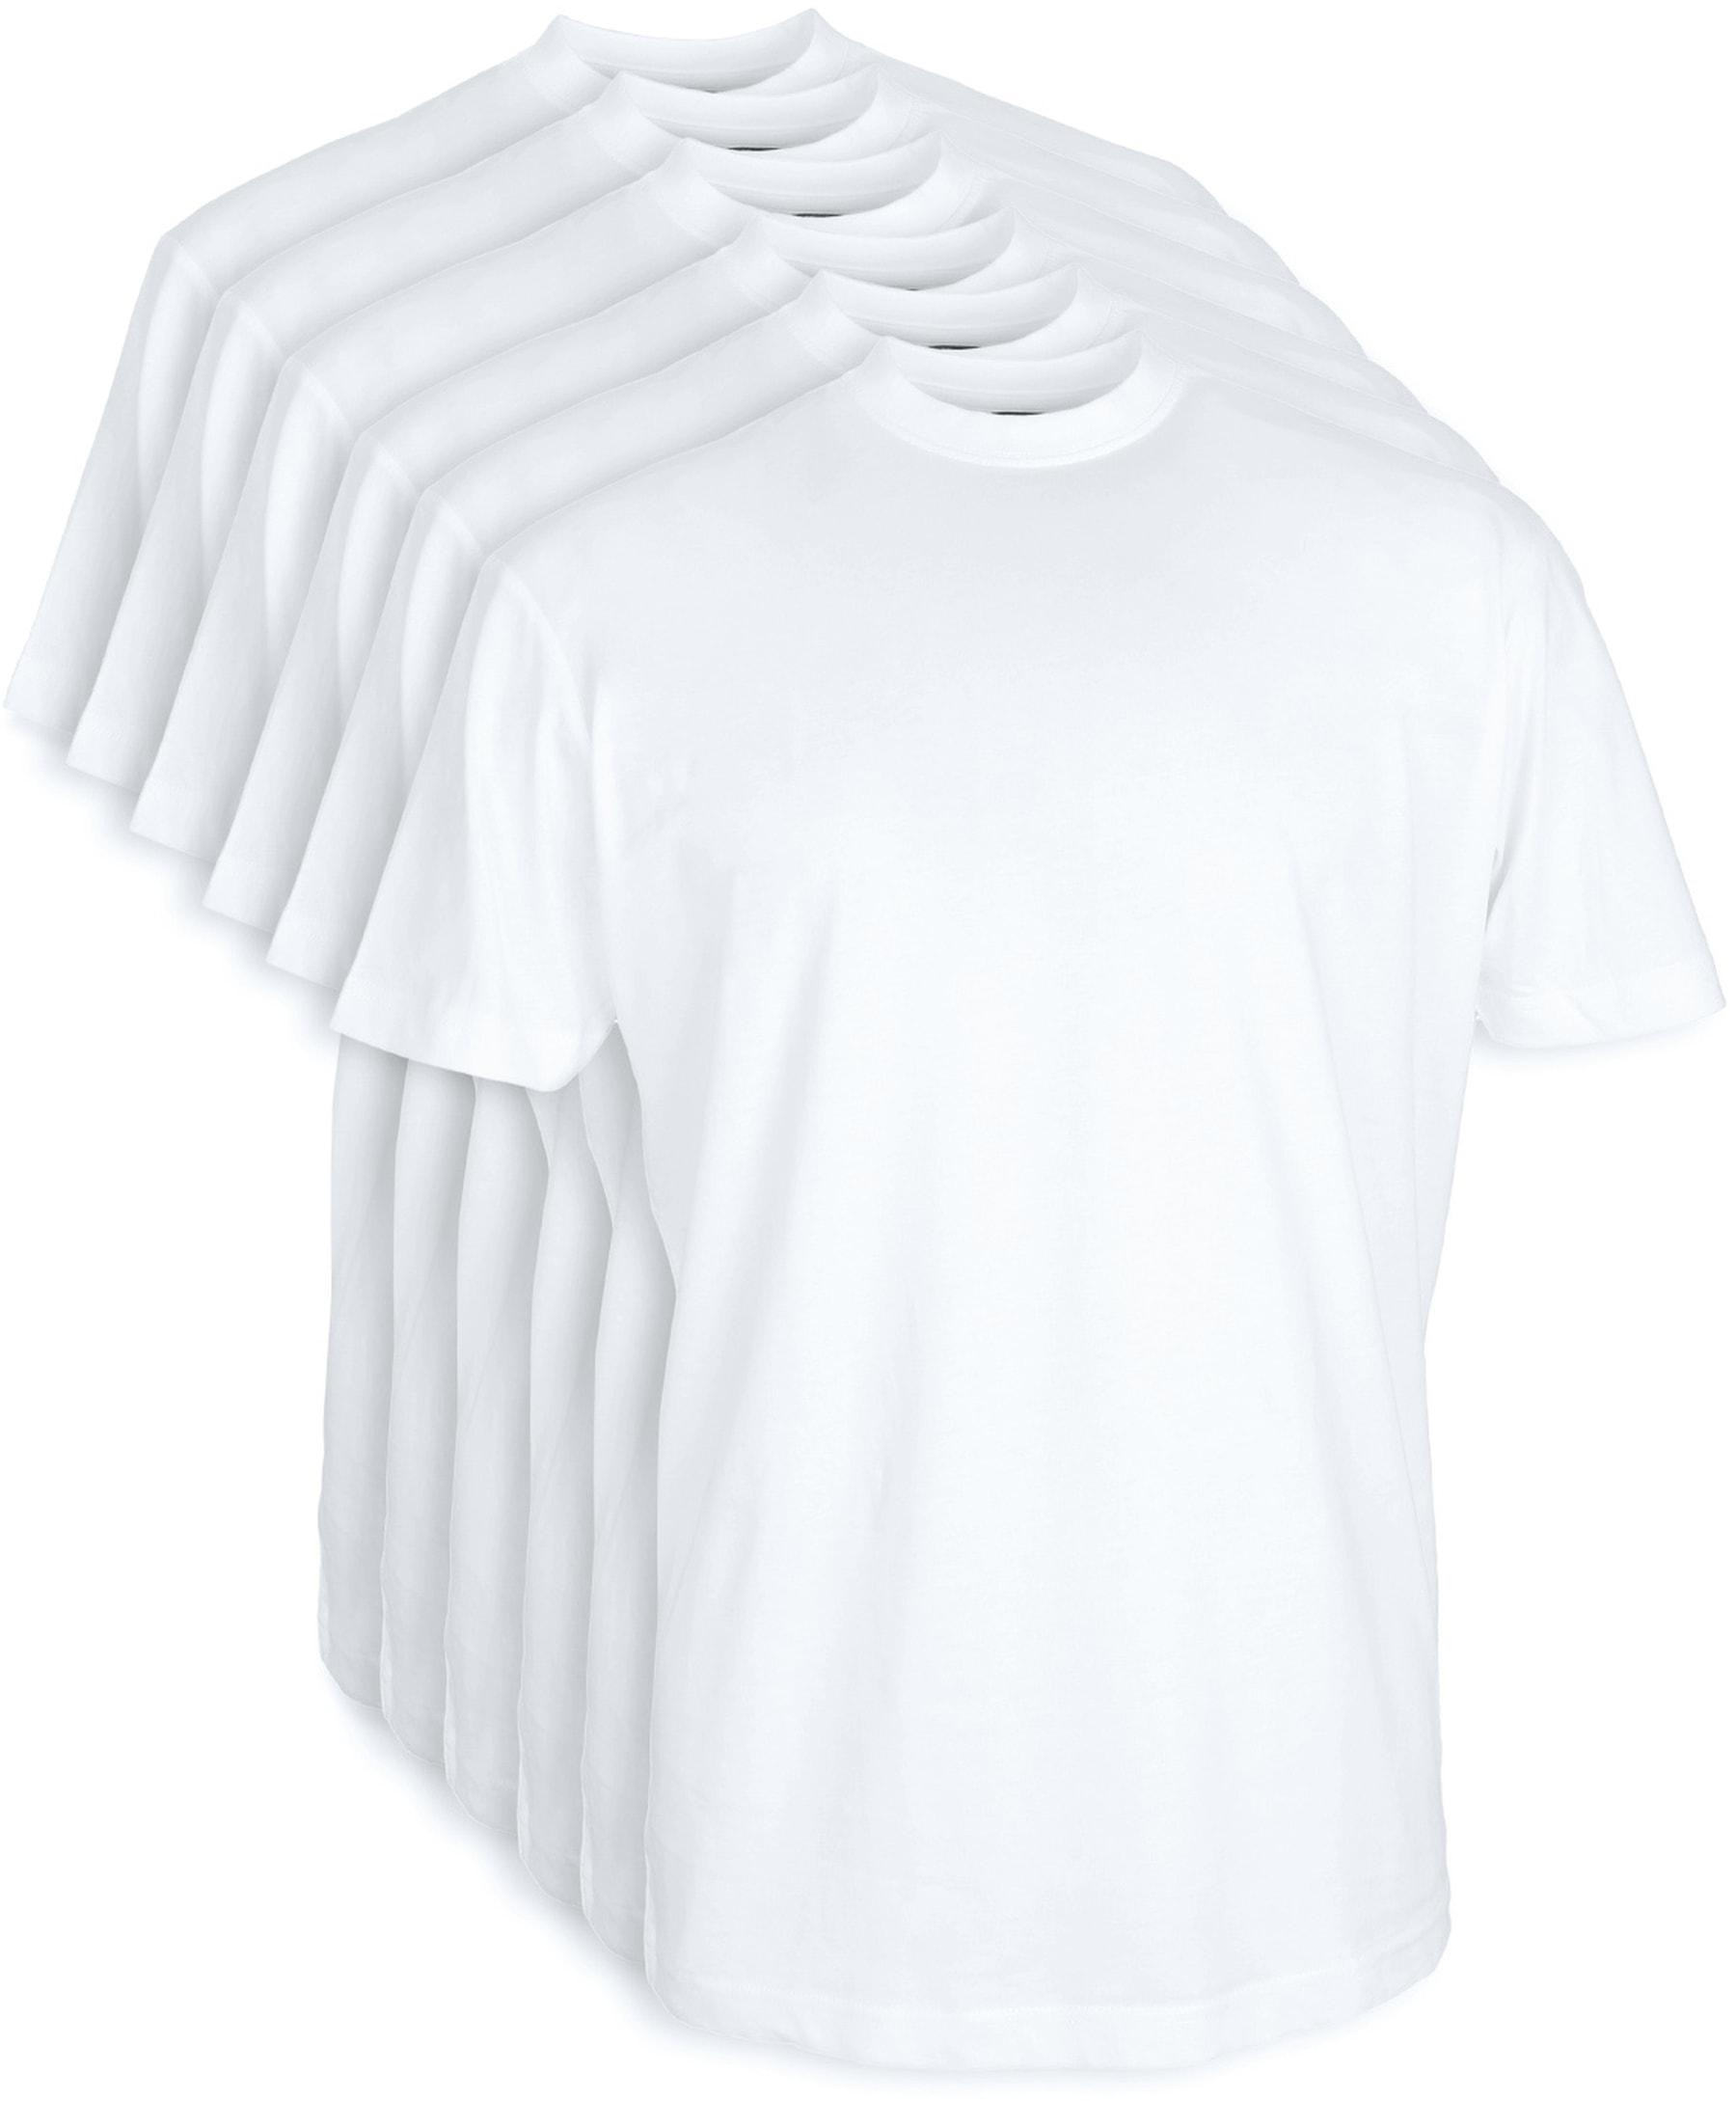 Suitable T-Shirt Obra 6er Pack Weiß